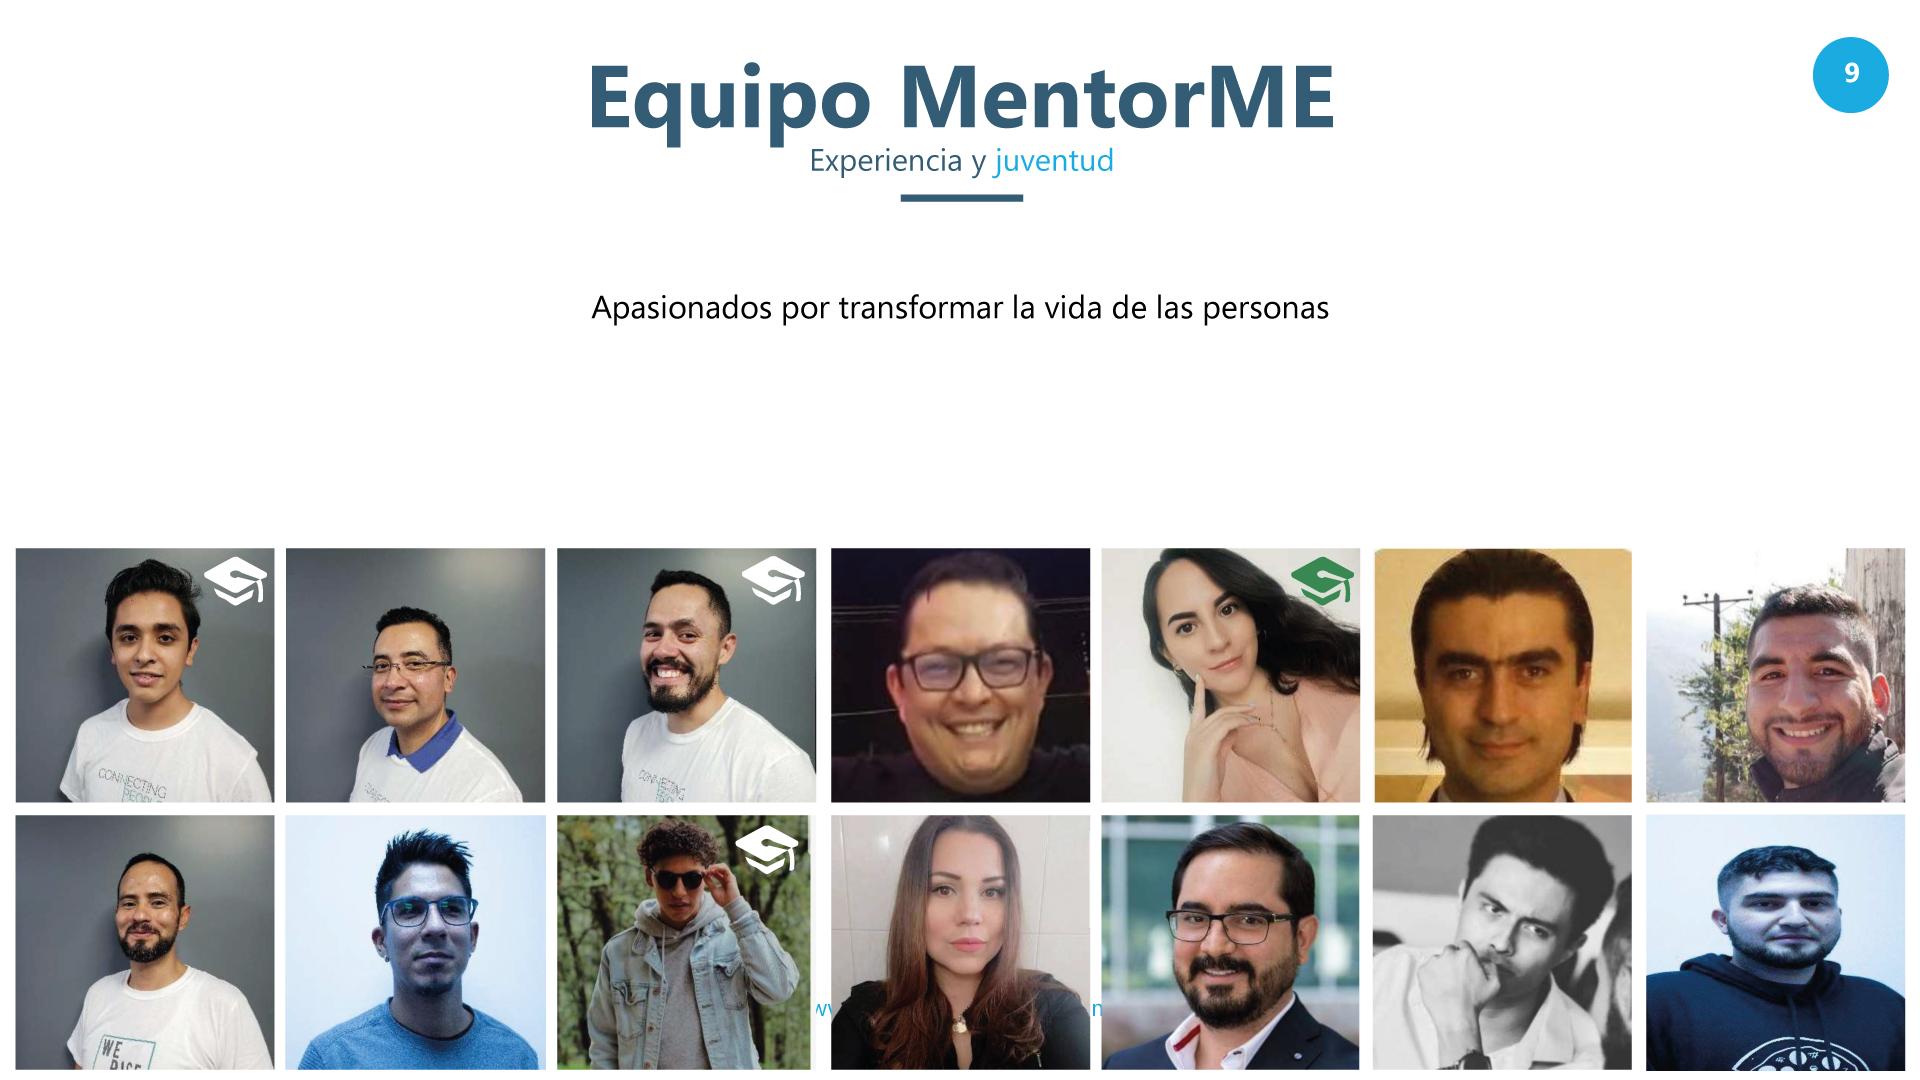 Integrantes de equipo MentorMe